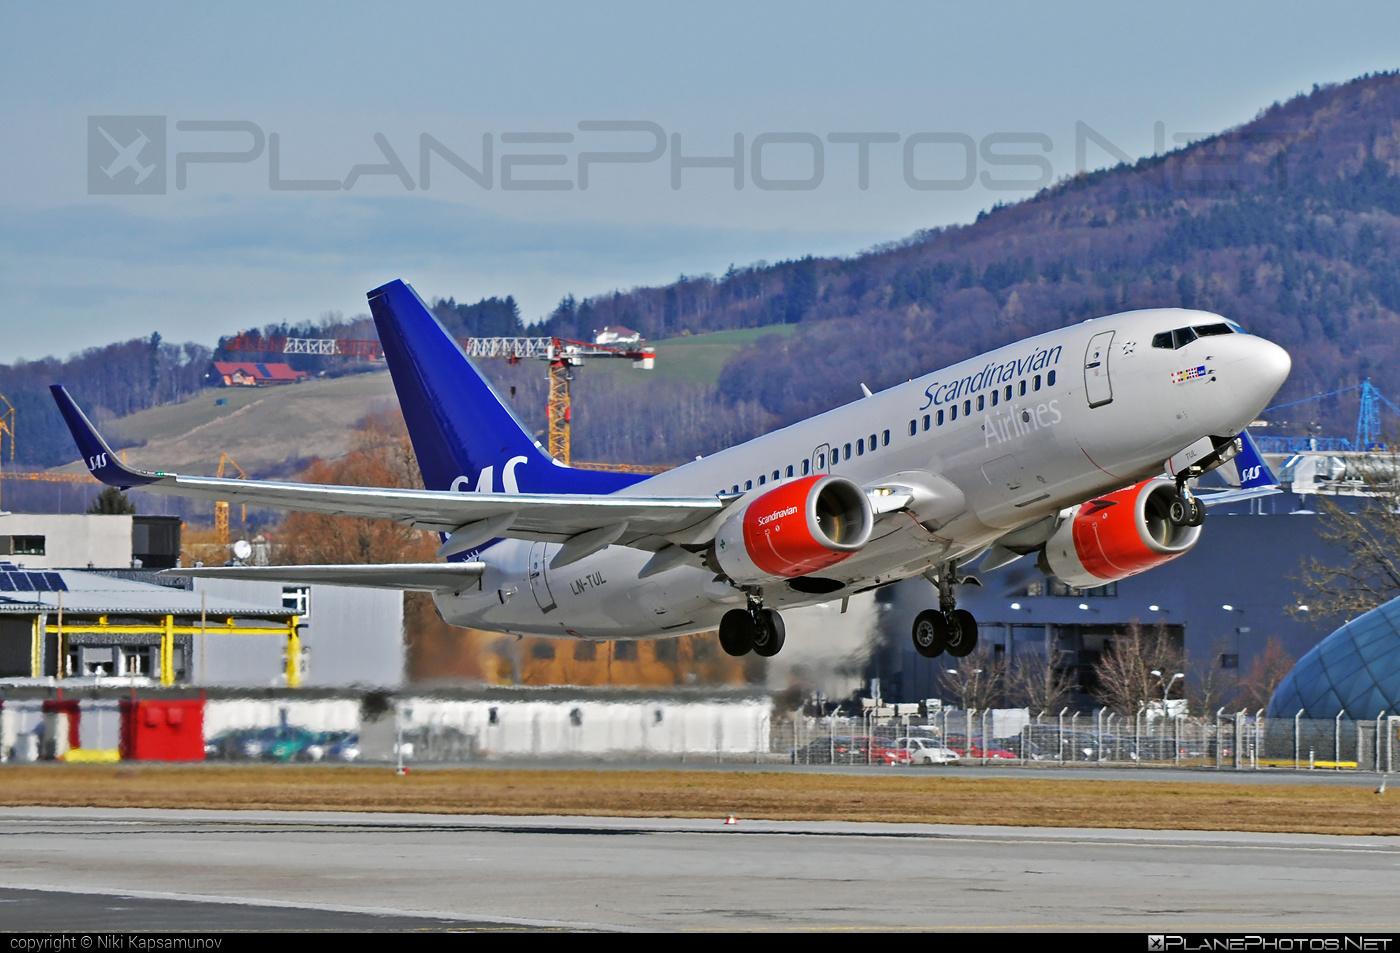 Boeing 737-700 - LN-TUL operated by Scandinavian Airlines (SAS) #b737 #b737nextgen #b737ng #boeing #boeing737 #sas #sasairlines #scandinavianairlines